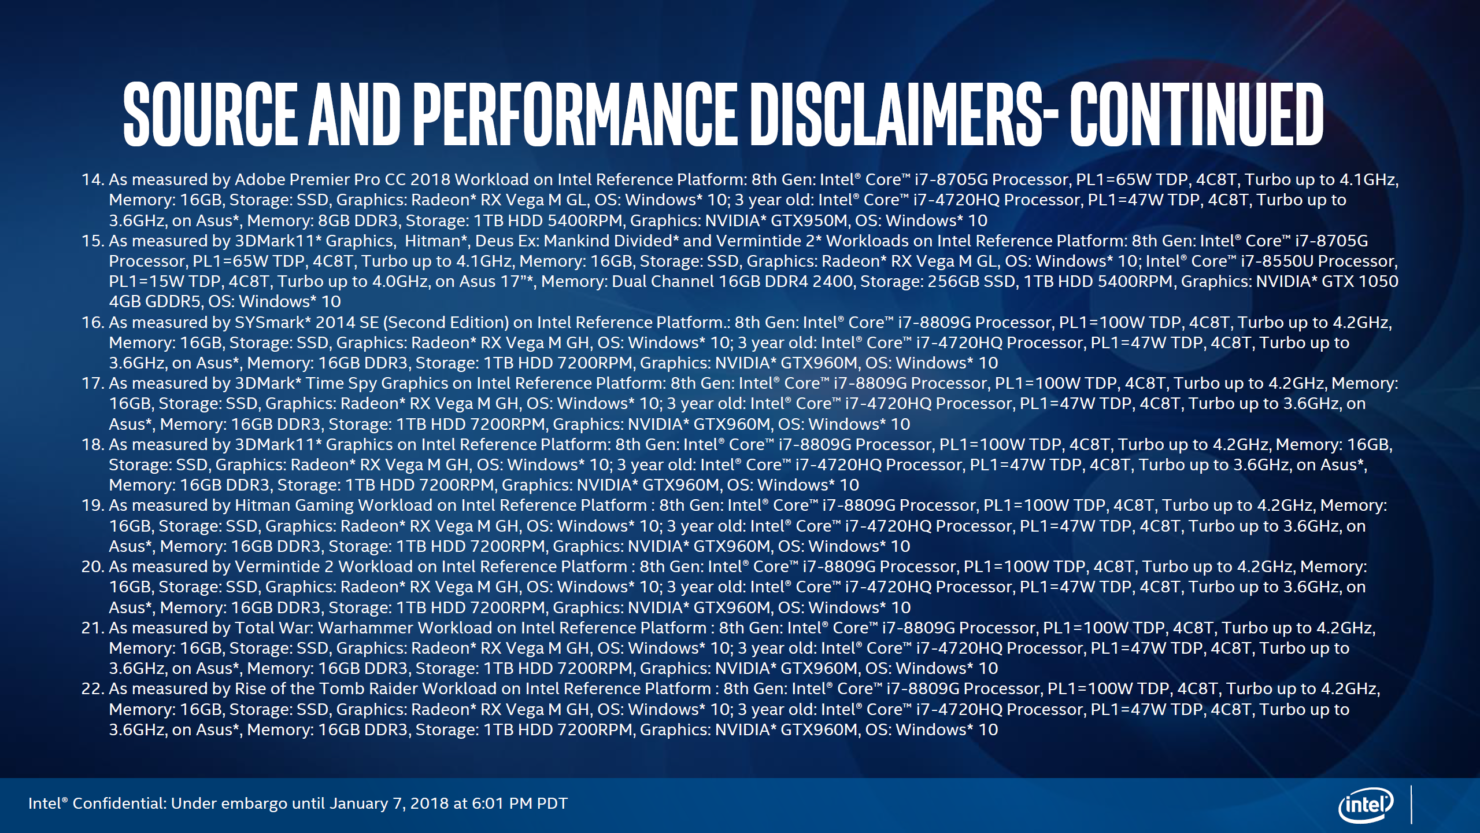 intel-8th-generation-core-processors-with-amd-radeon-rx-vega-m-graphics_31-2